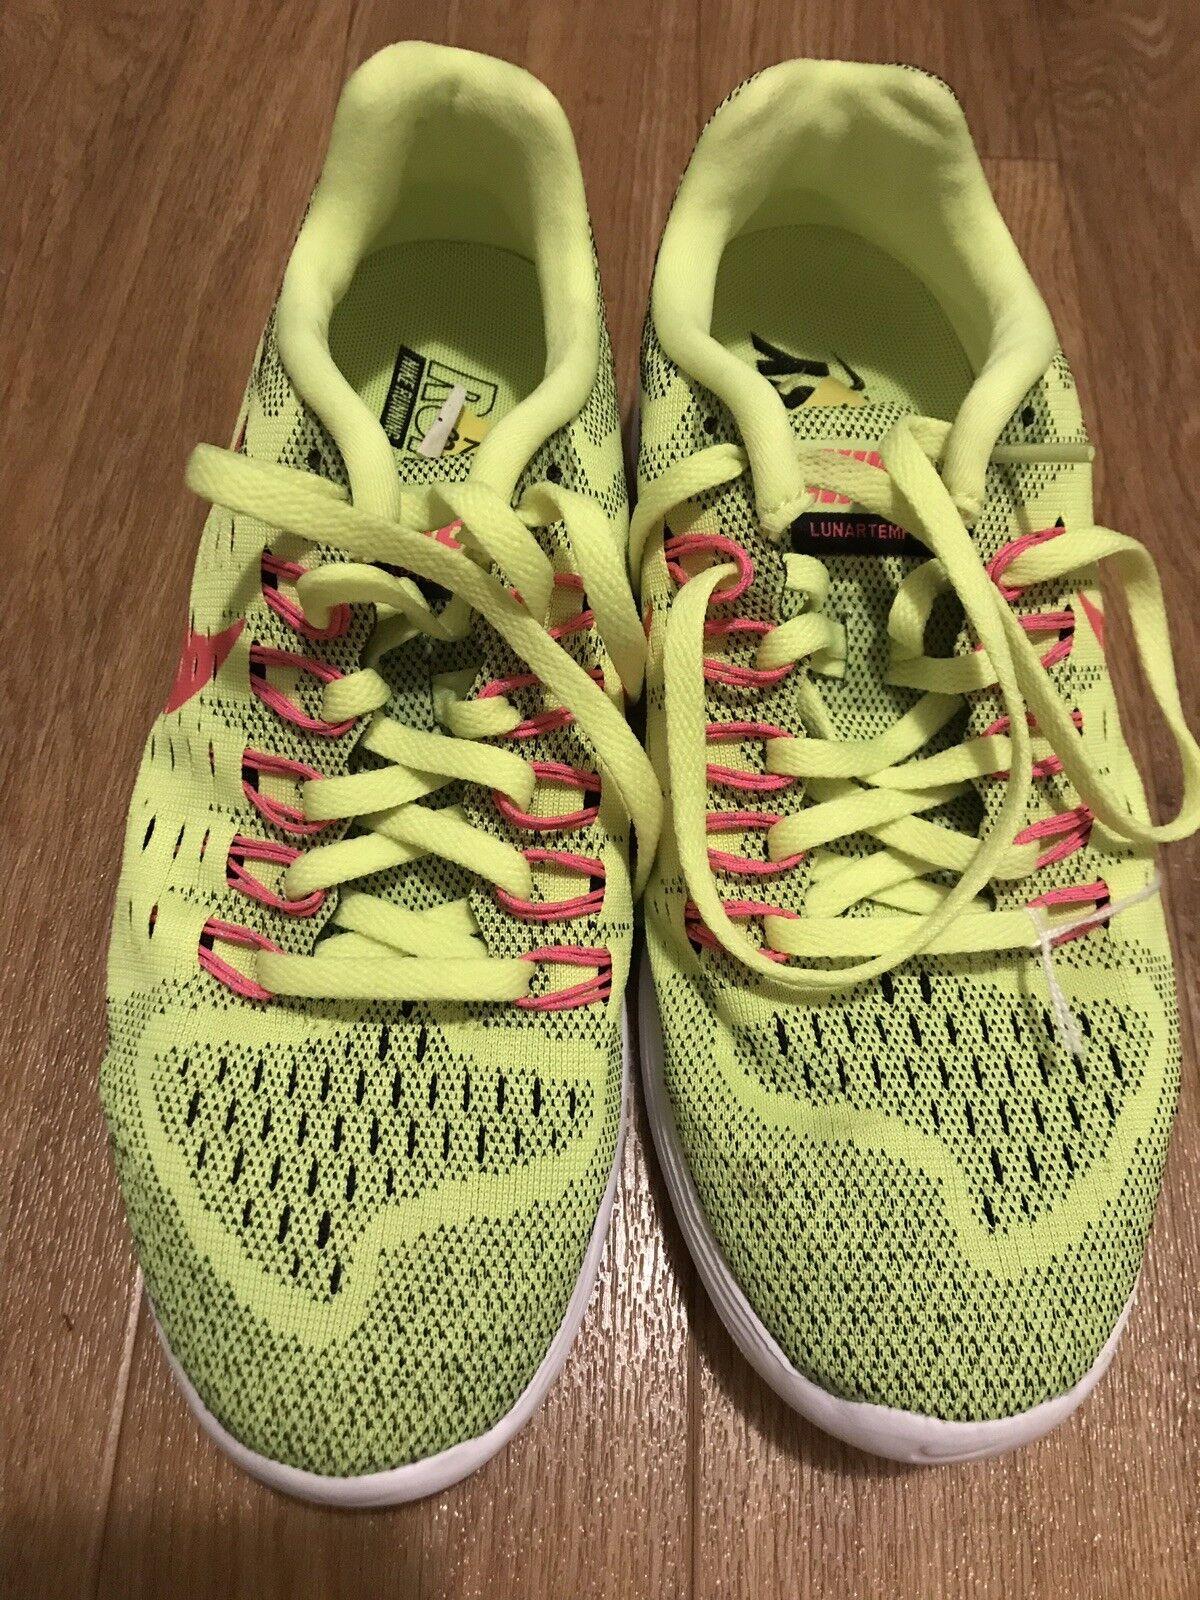 BRAND NEW Nike Ladies Trainers Uk Sise 5 Runeasy Lunarlon